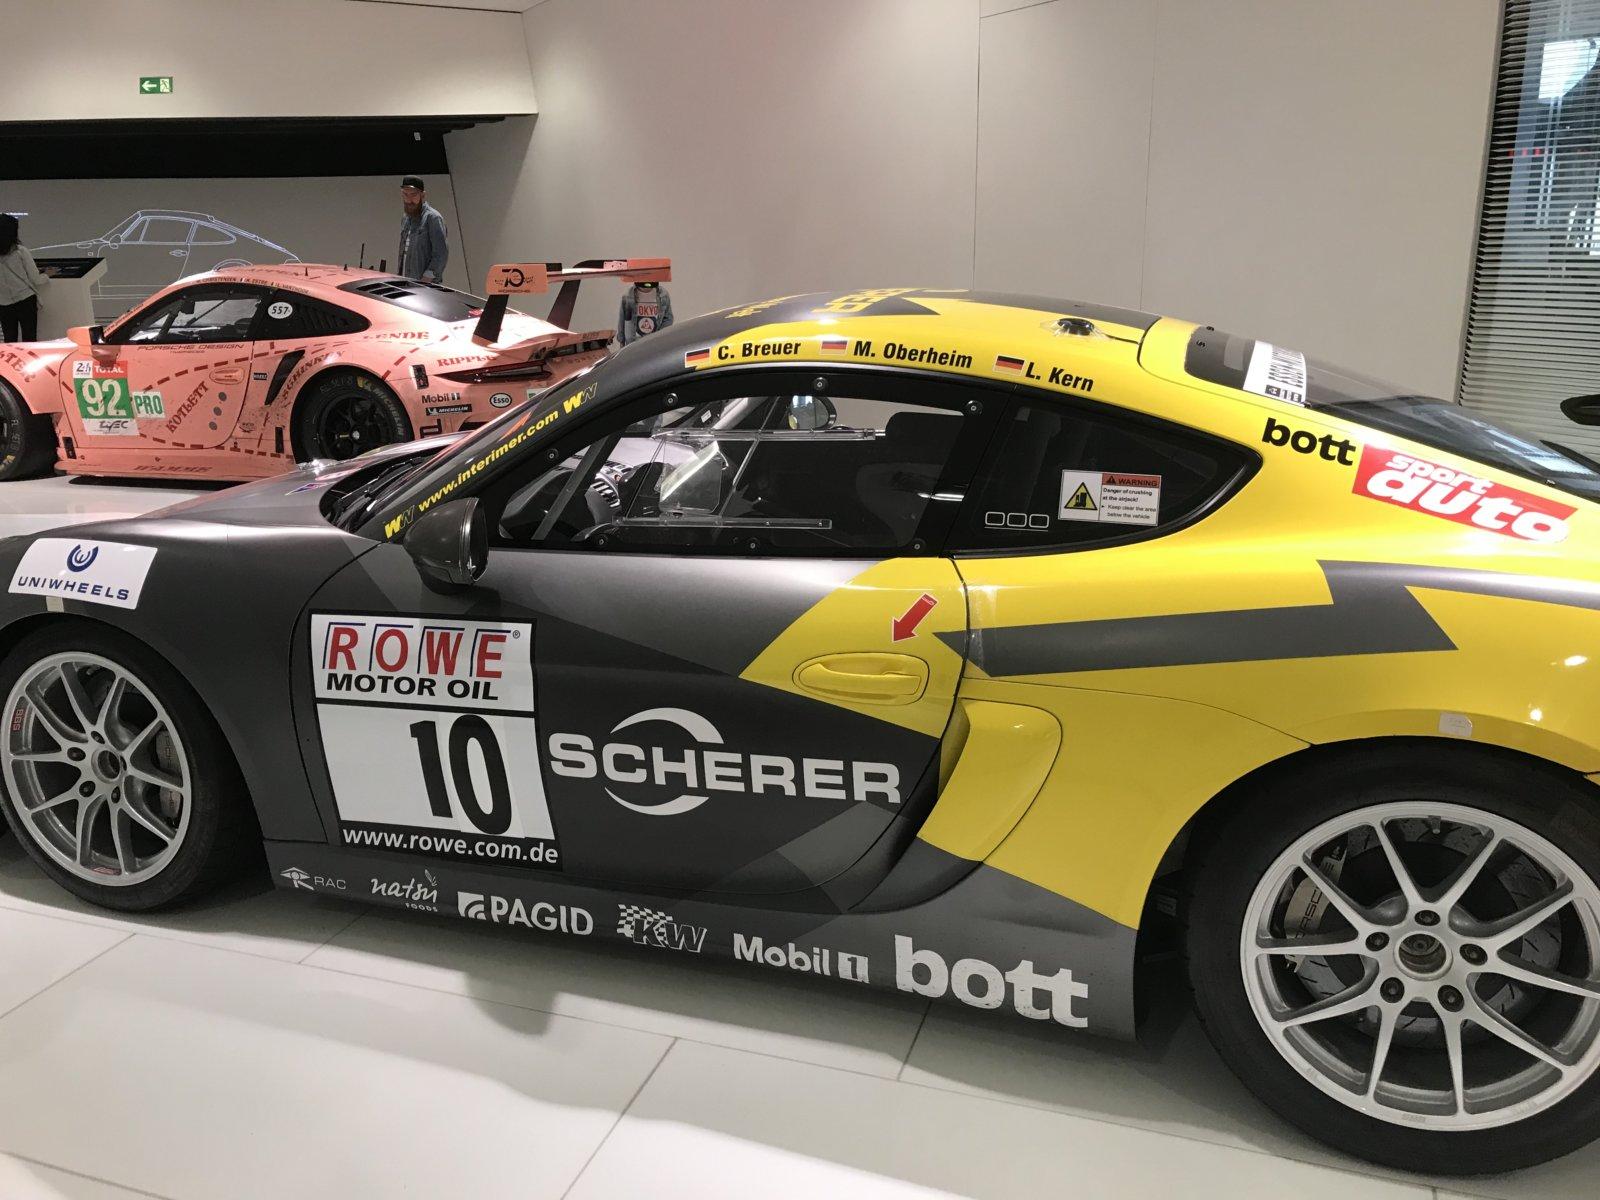 07-28 Porsche Race Car 35